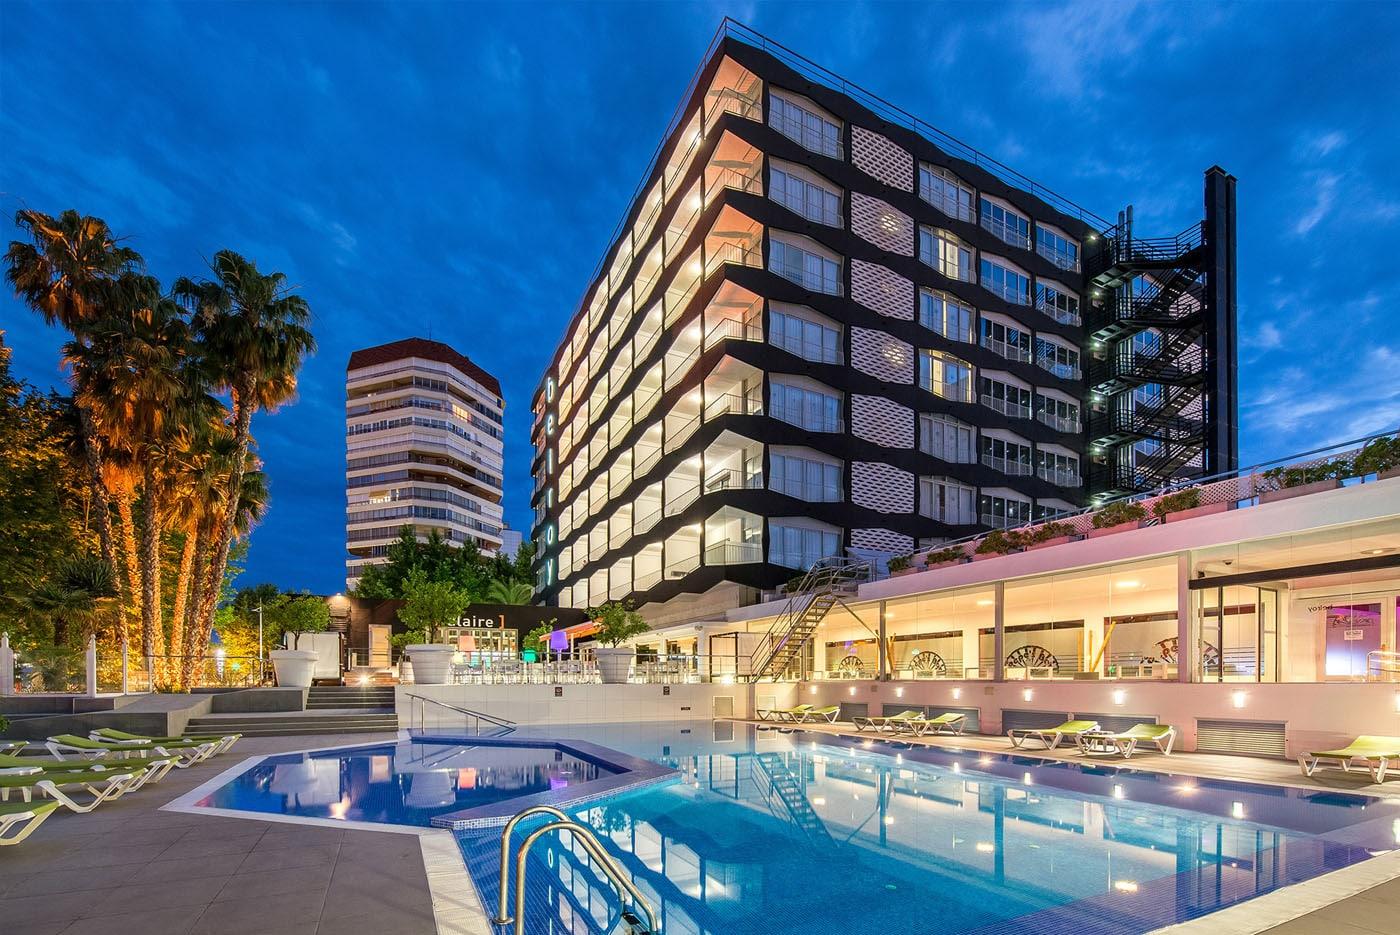 hotel-belroy-adolfo-gosalvez-hoteles-panoramicos